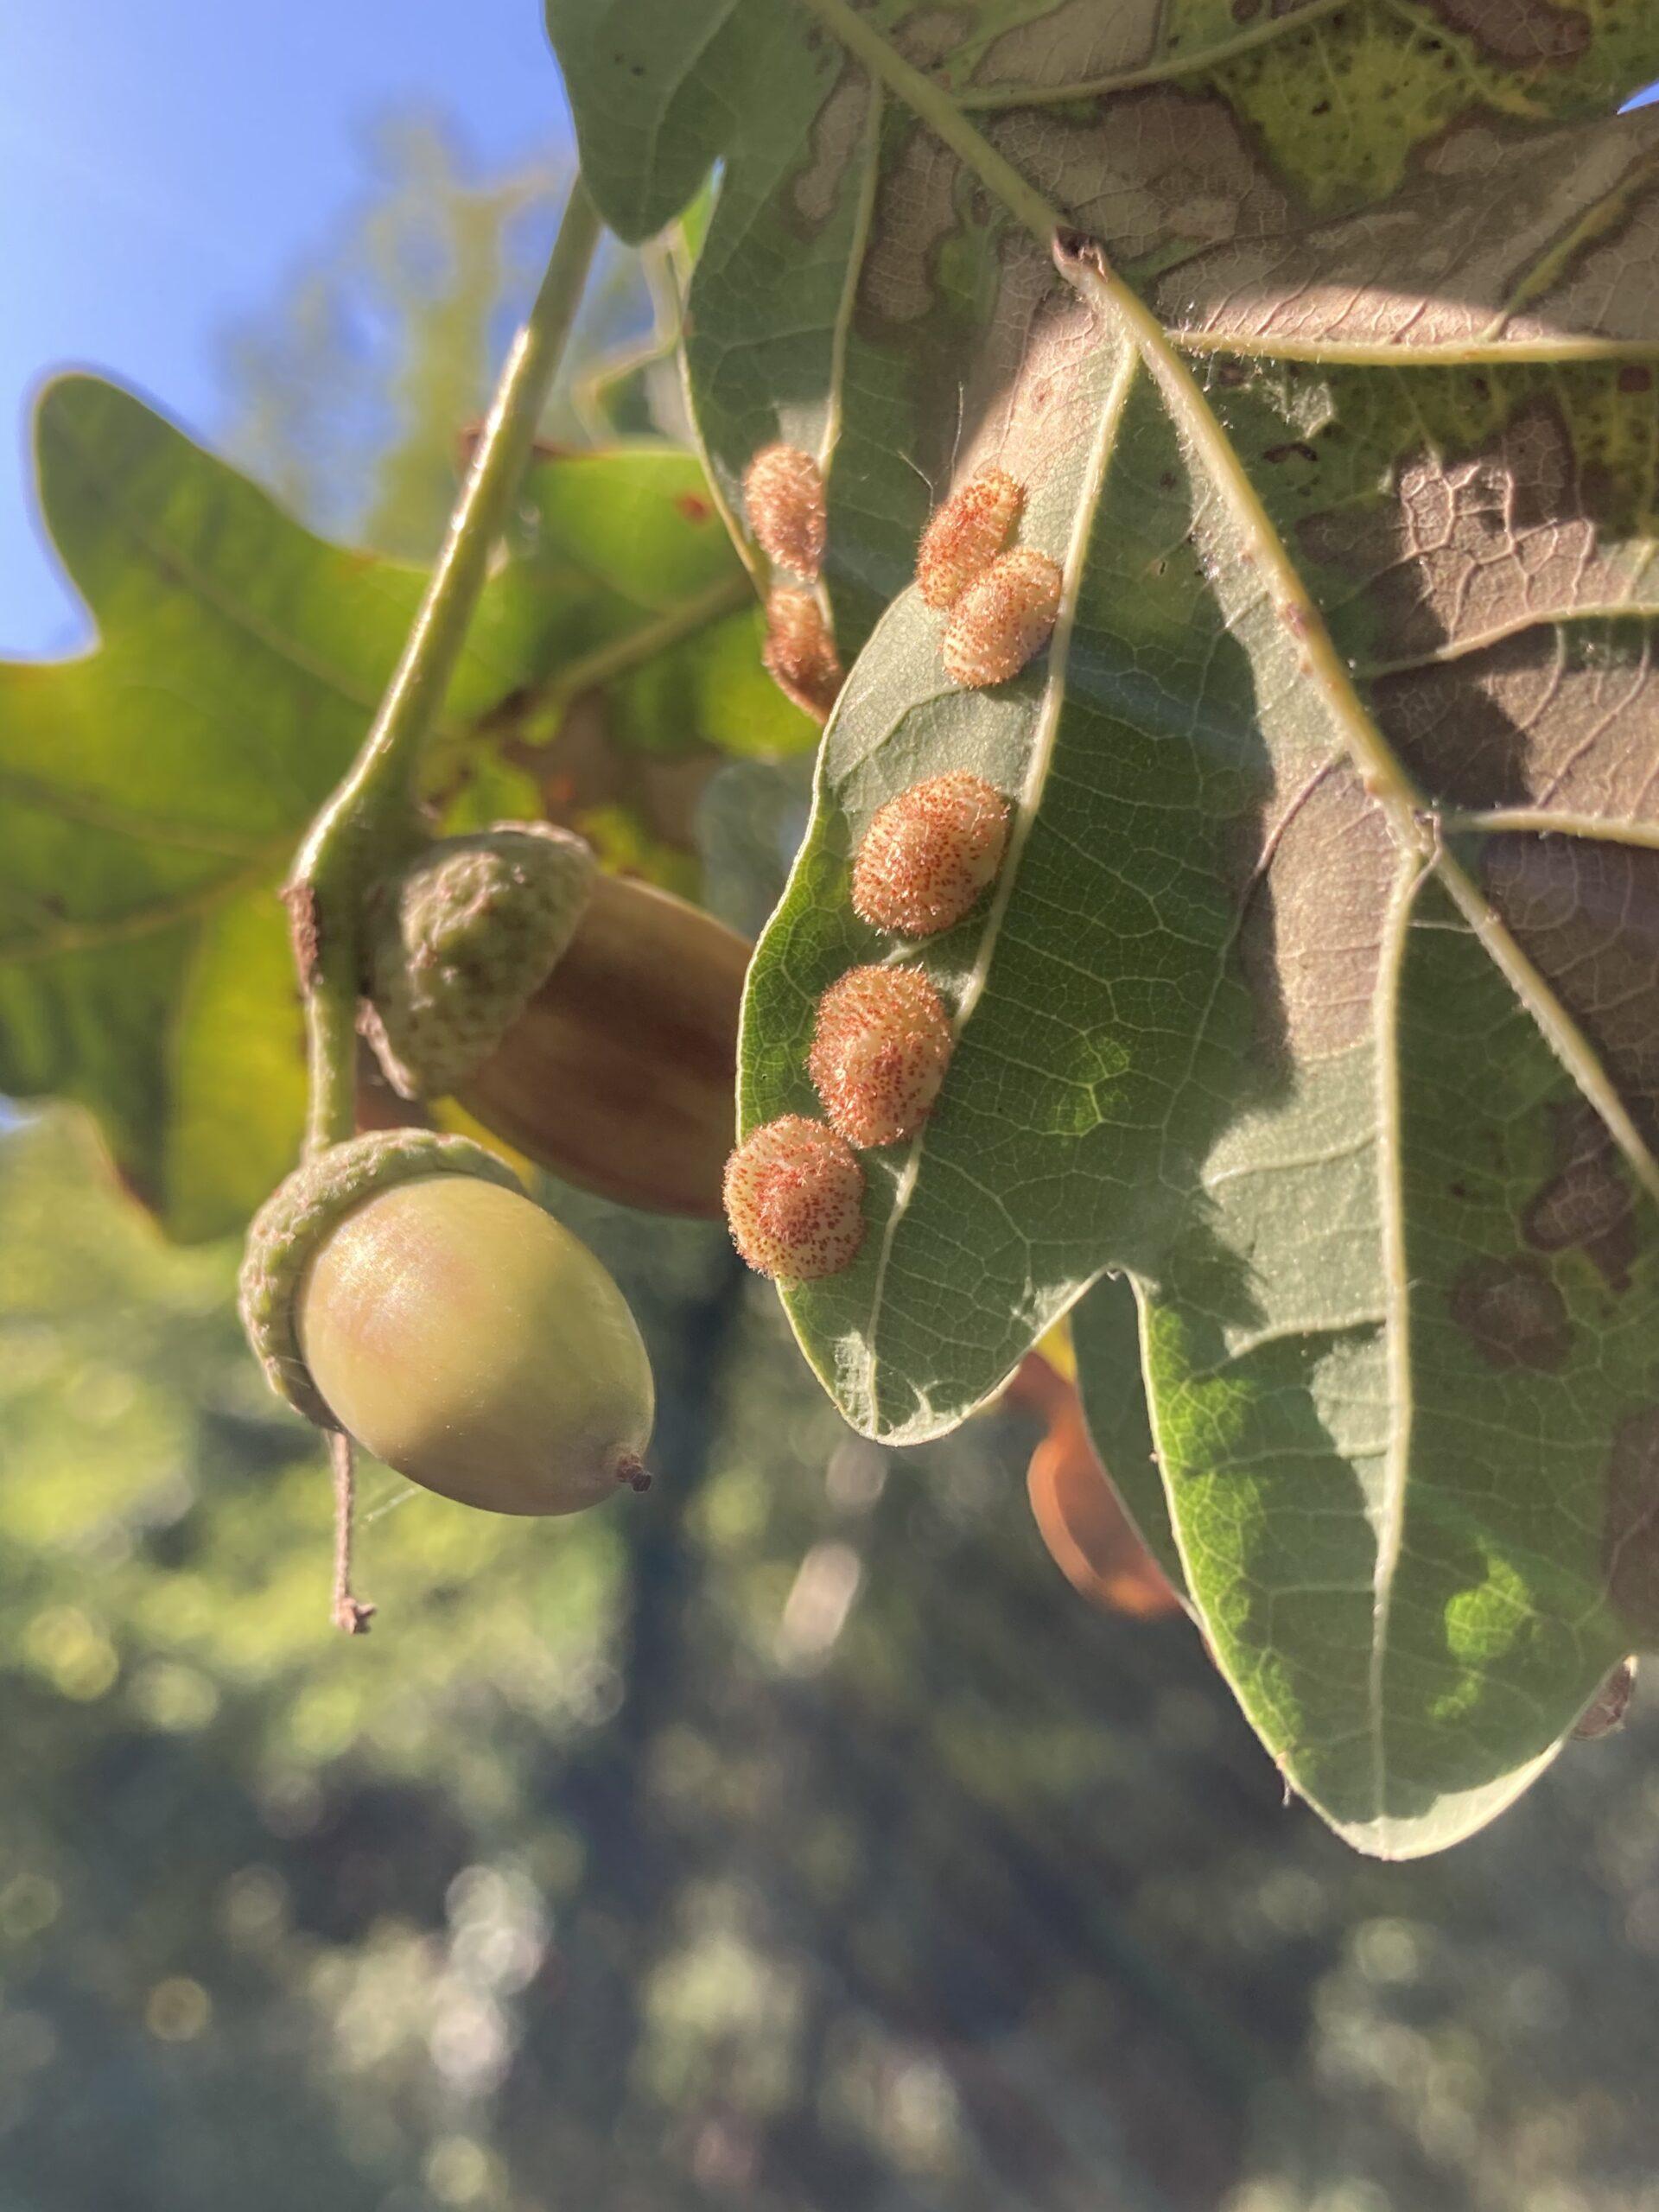 Common spangle gall (Neuroterus quercusbaccarum) oak leaves